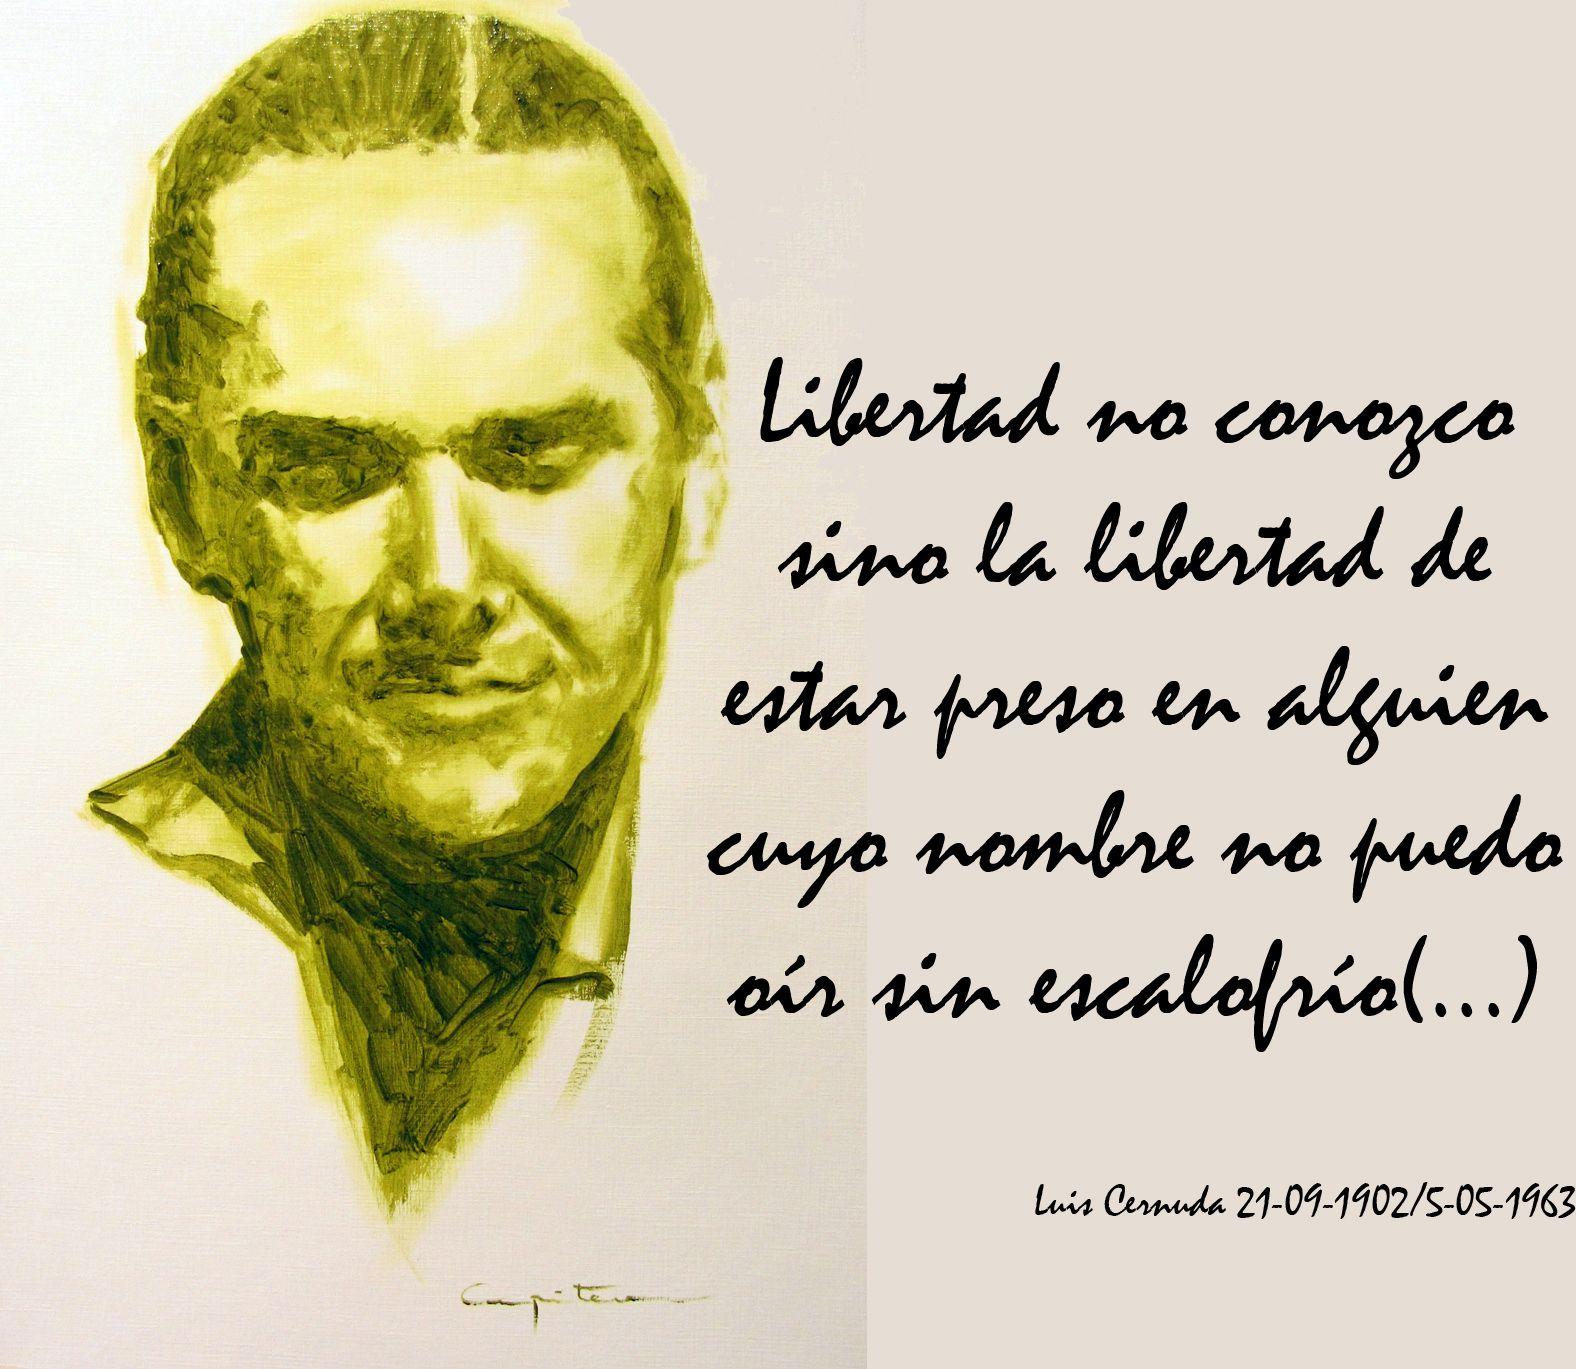 Cernuda Poetas Luis Cernuda Literature Movie Posters Y Art